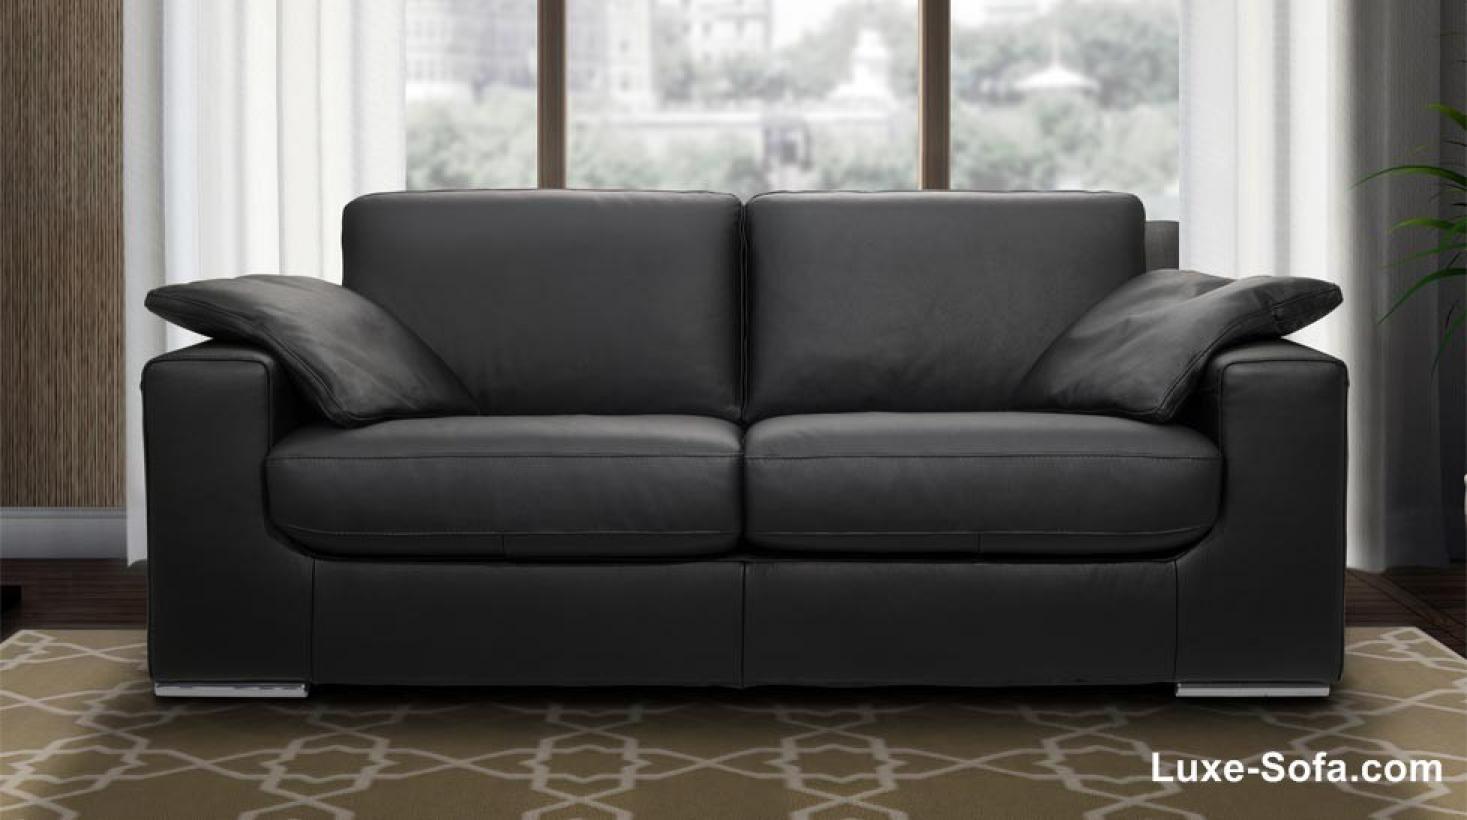 photos canap en cuir italien. Black Bedroom Furniture Sets. Home Design Ideas